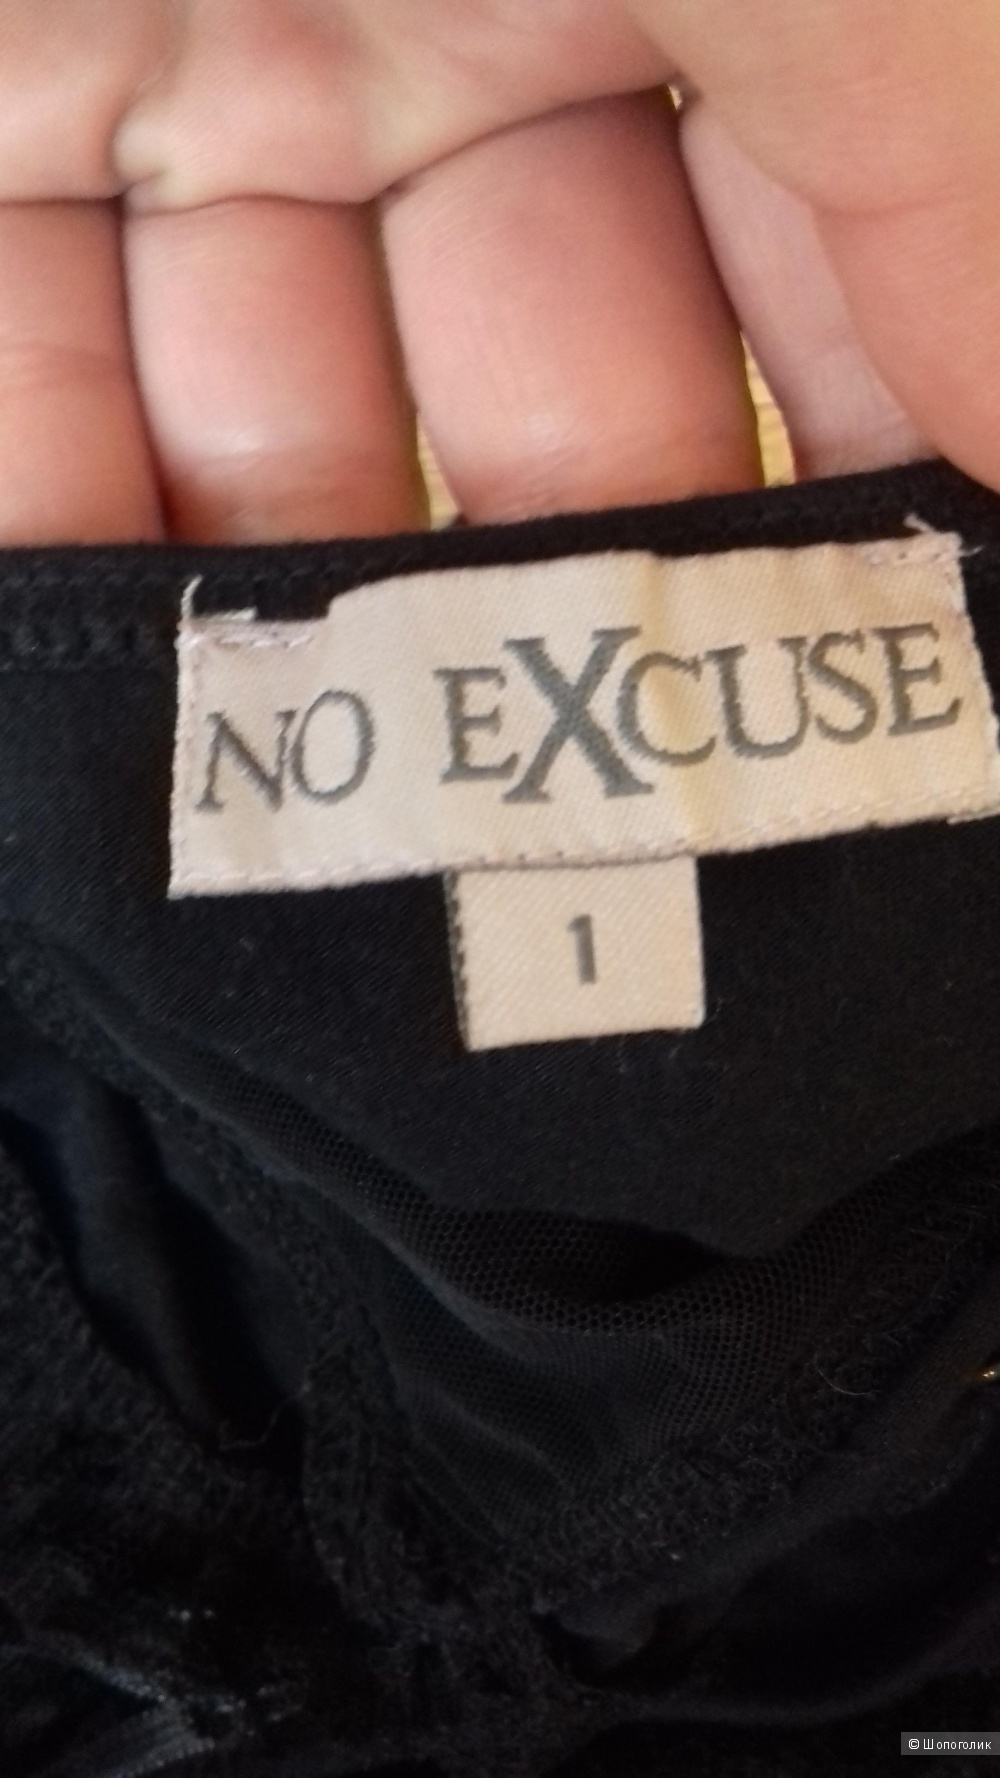 Топ NO EXCUSE, Франция, размер 1